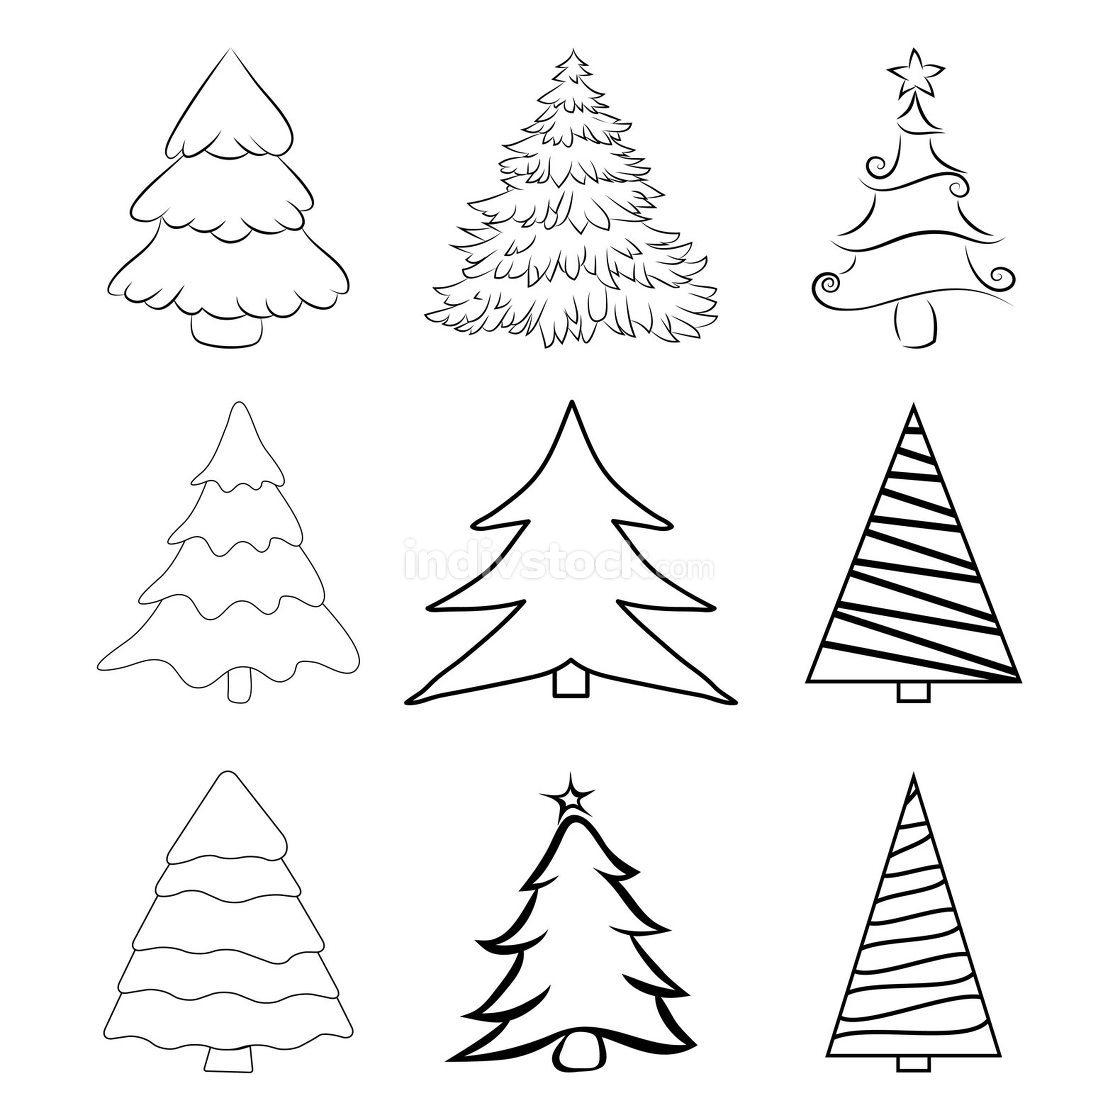 Christmas trees outline set. Contour of pines for xmas card or i